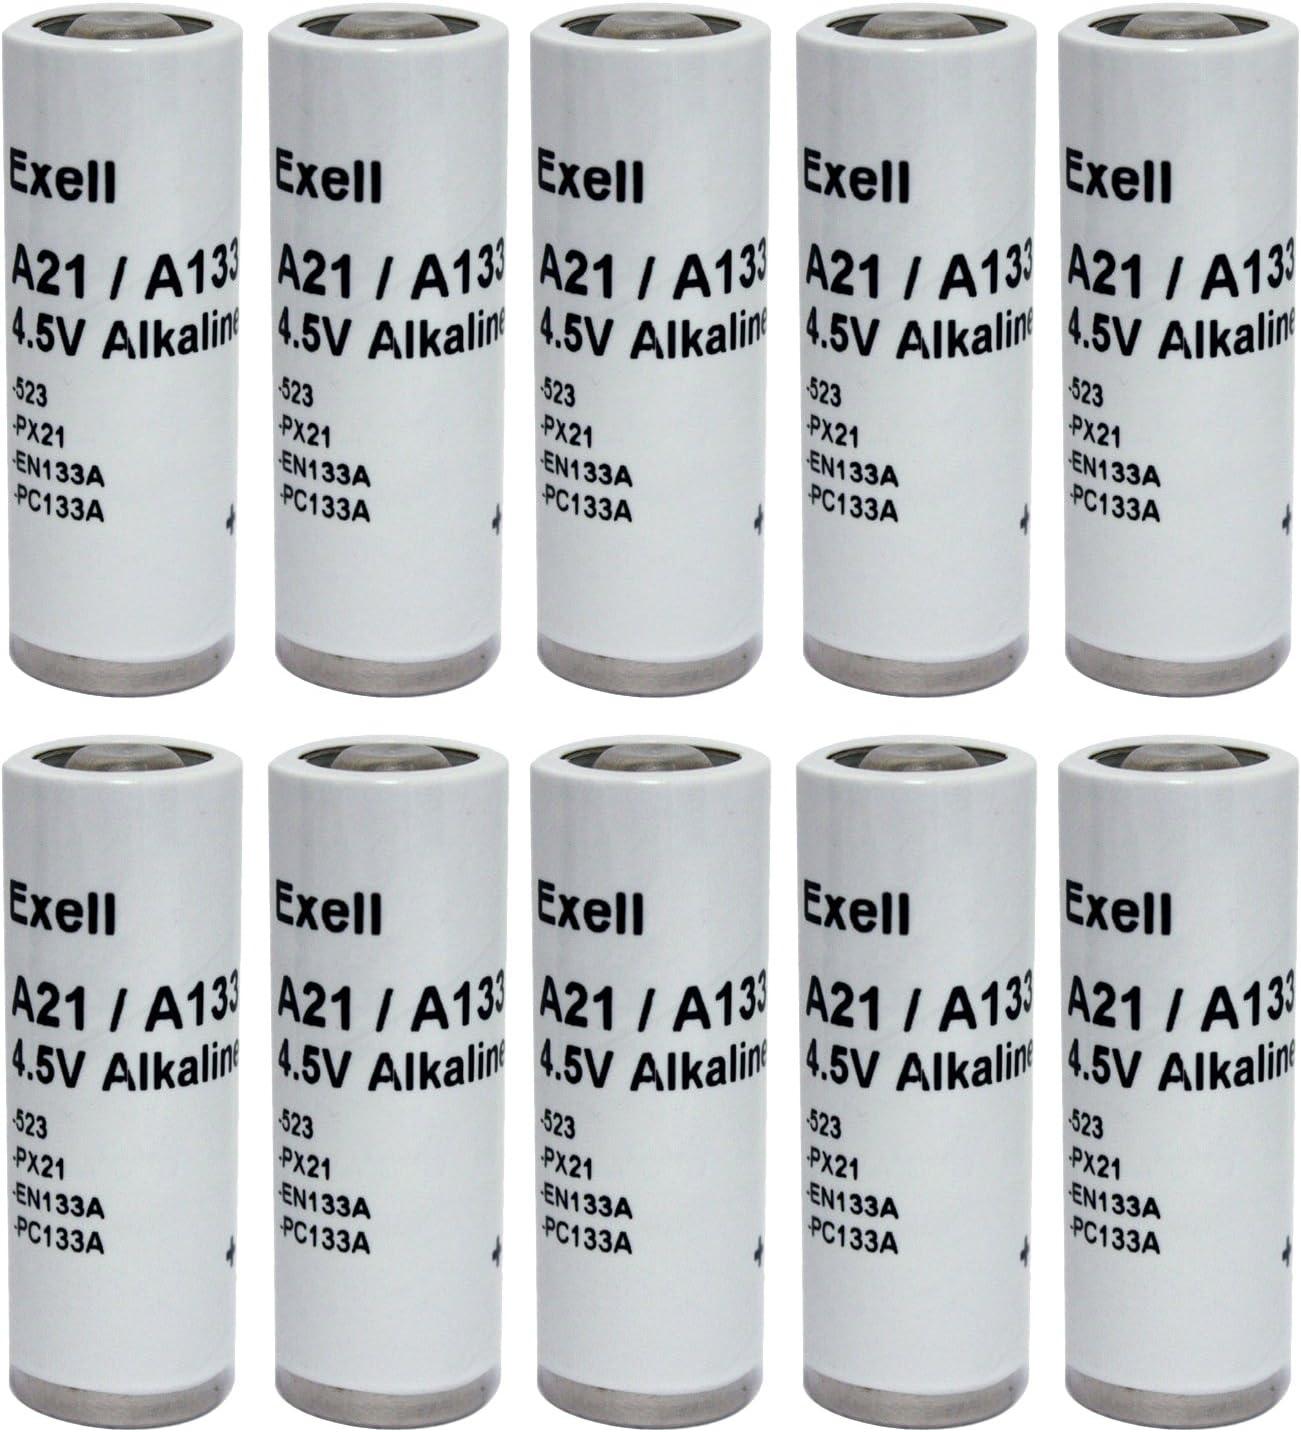 10pc Exell A21PX 4.5V Alkaline Battery 523 EN133A PC133A PX21 1306AP